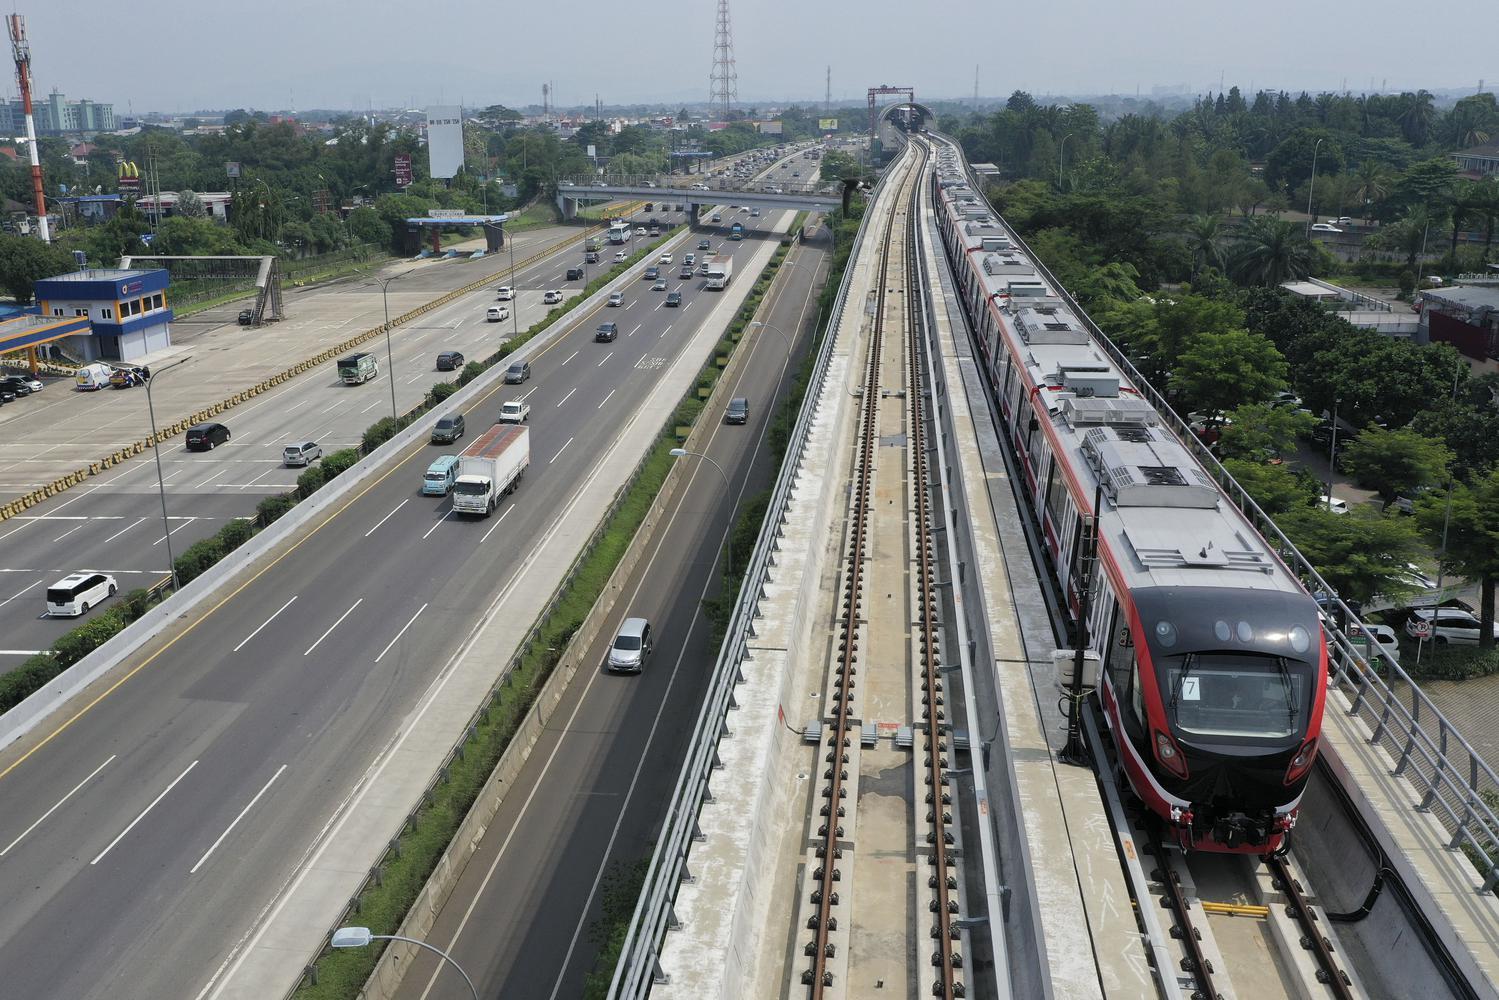 Kereta api ringan (LRT) berada di lintasan LRT Jabodebek Cawang-Cibubur di Cibubur, Jakarta, Kamis (29/10/2020). Pihak operator konstruksi LRT Jabodebek Cawang-Cibubur telah memulai tahapan uji coba